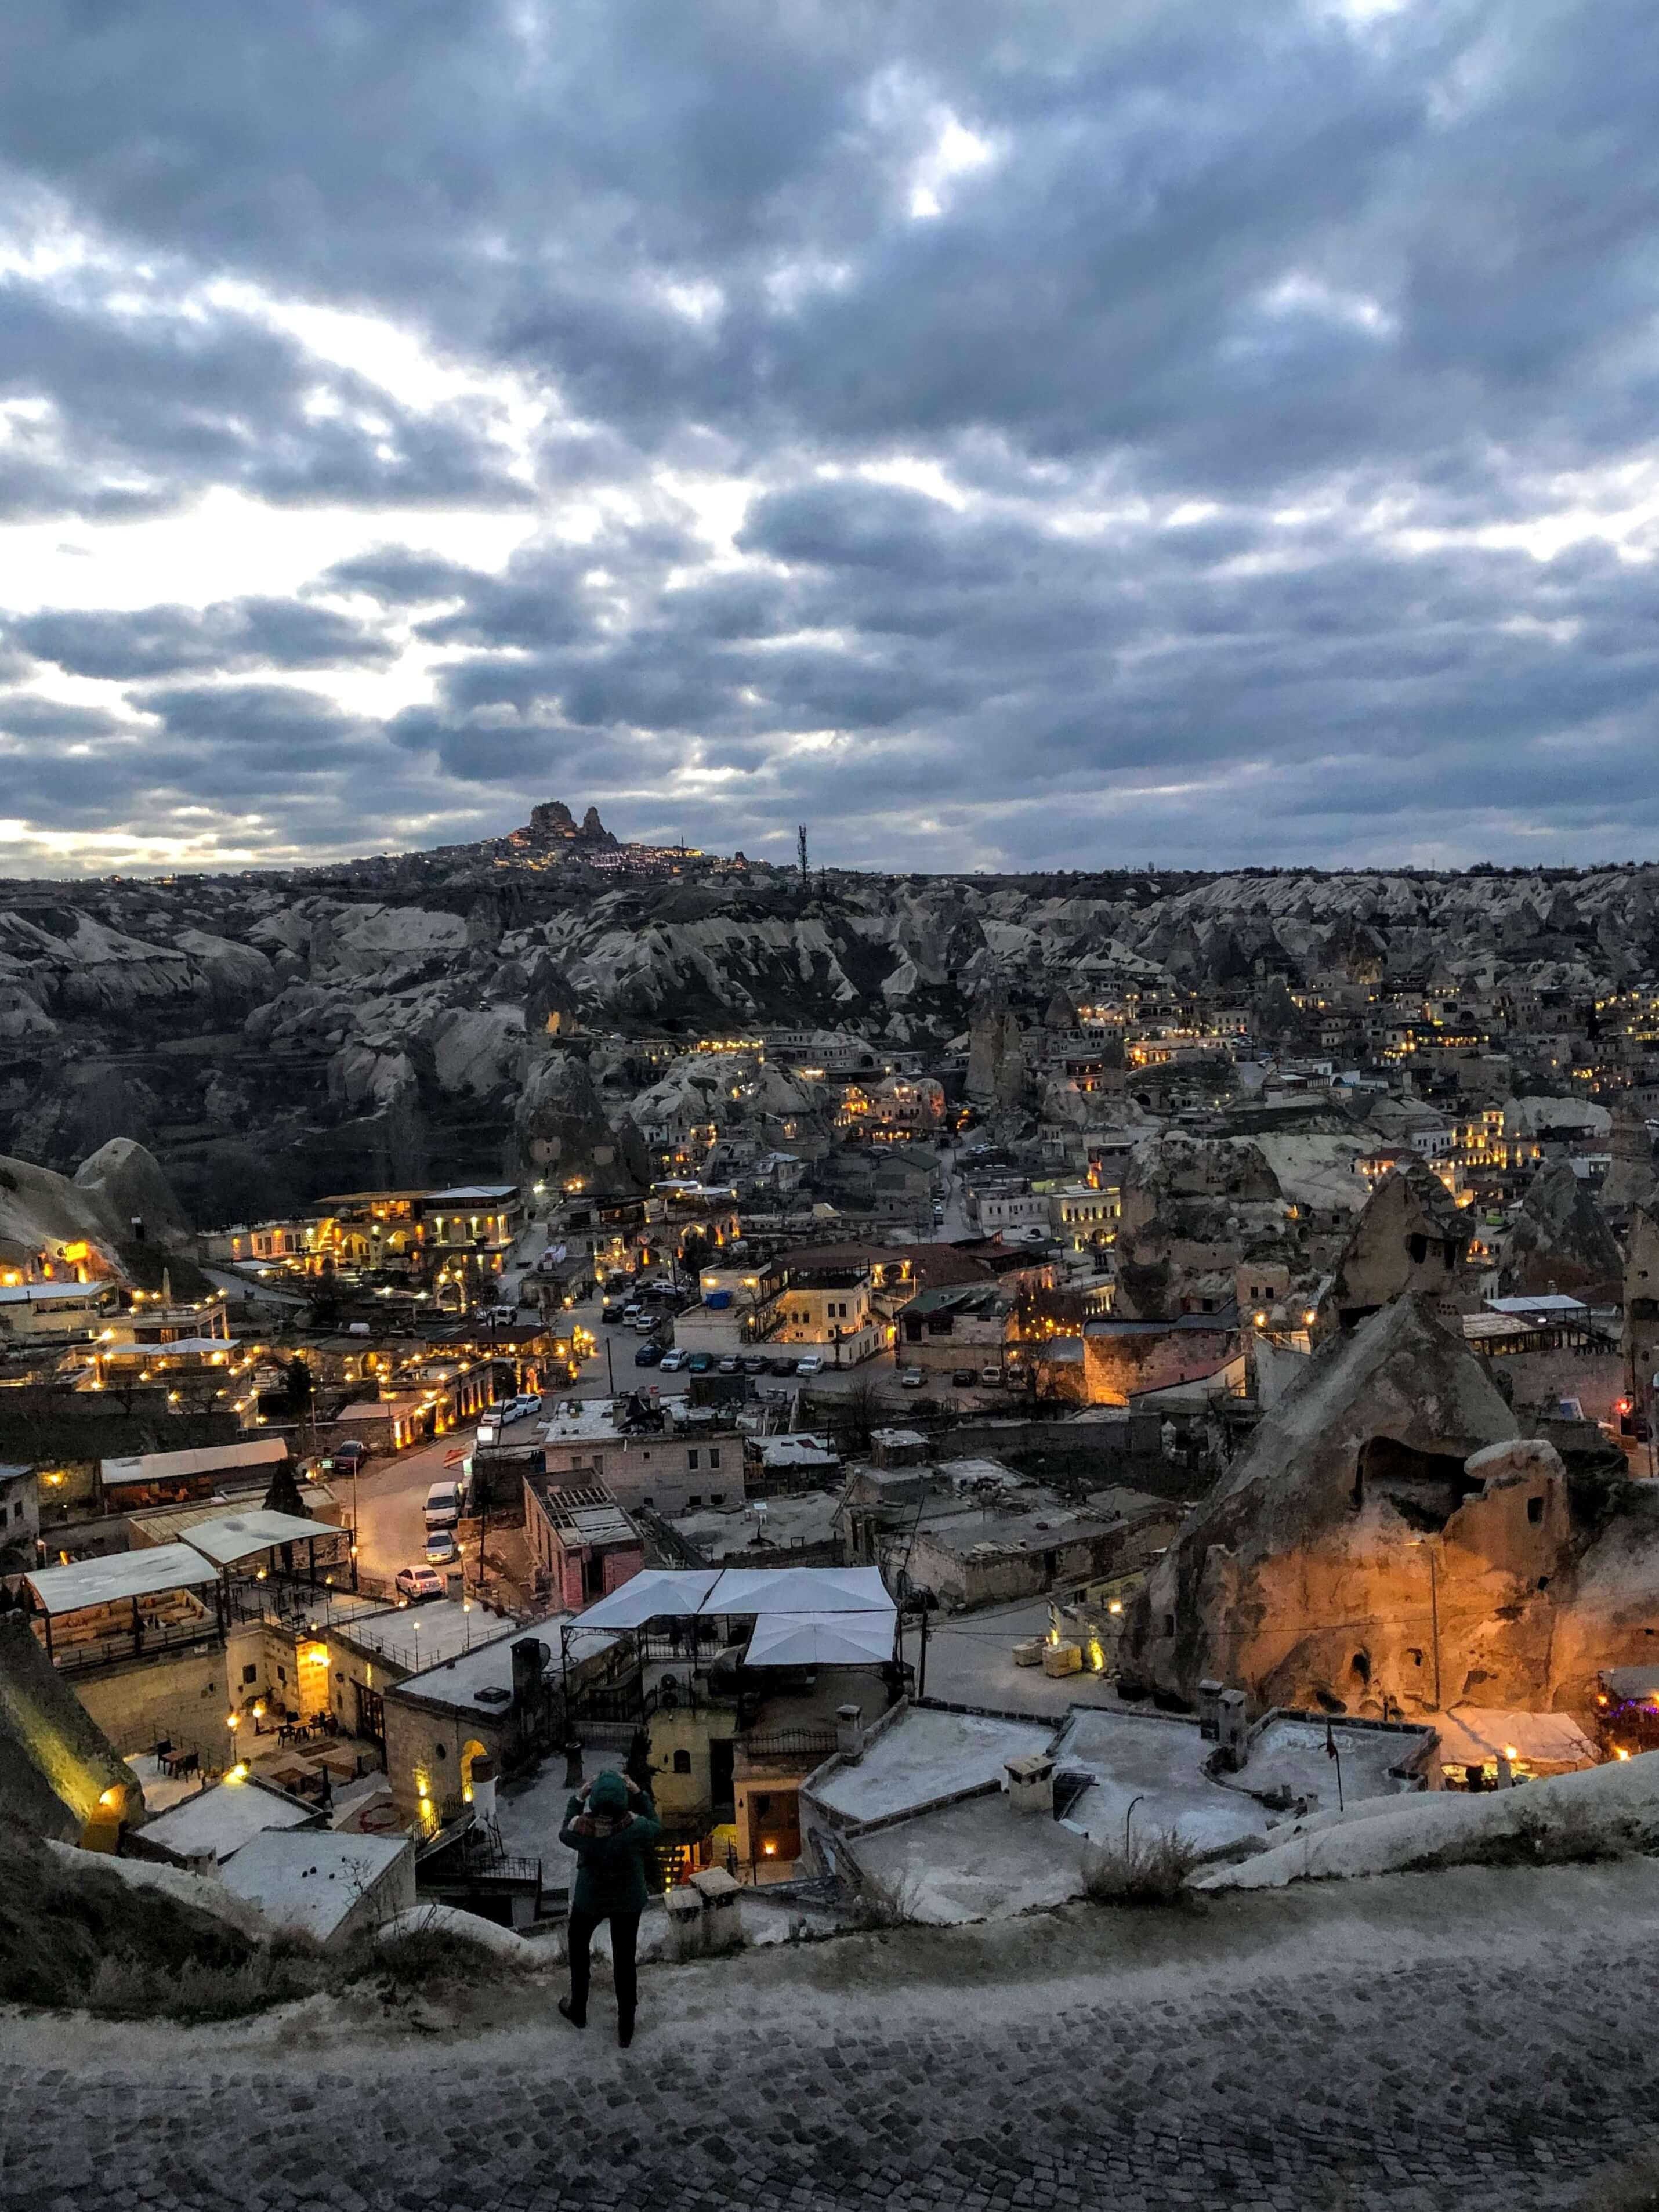 dusk in Goreme National Park in Cappadocia, Turkey